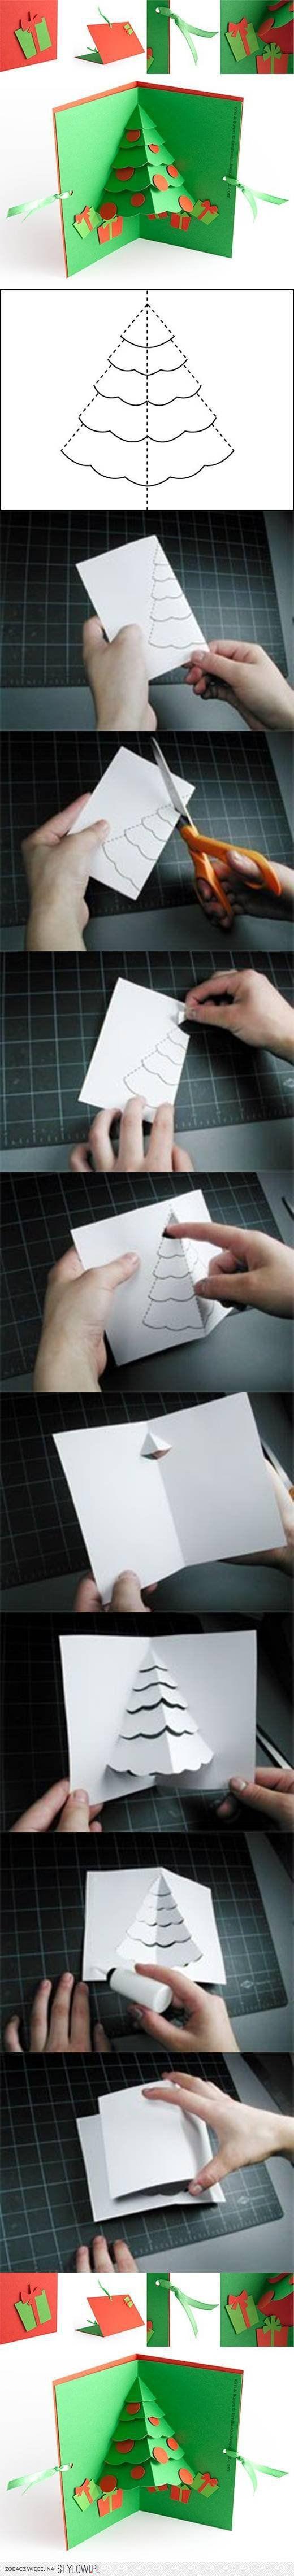 DIY Christmas Tree Pop Up Card DIY Projects | UsefulDIY… na Stylowi.pl